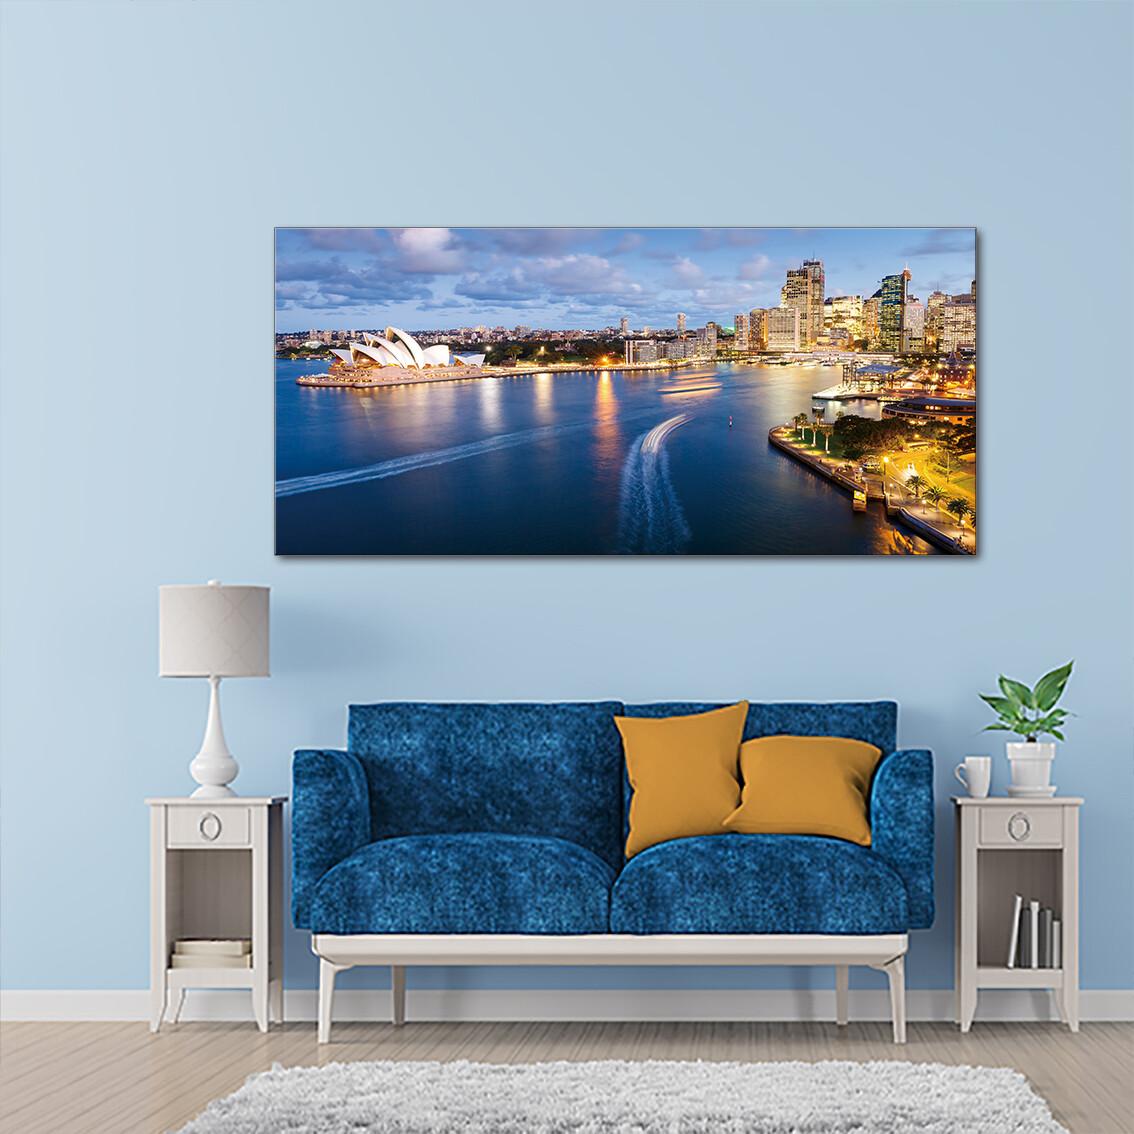 Sydney Circular Quay  - Modern Luxury Wall art Printed on Acrylic Glass - Frameless and Ready to Hang